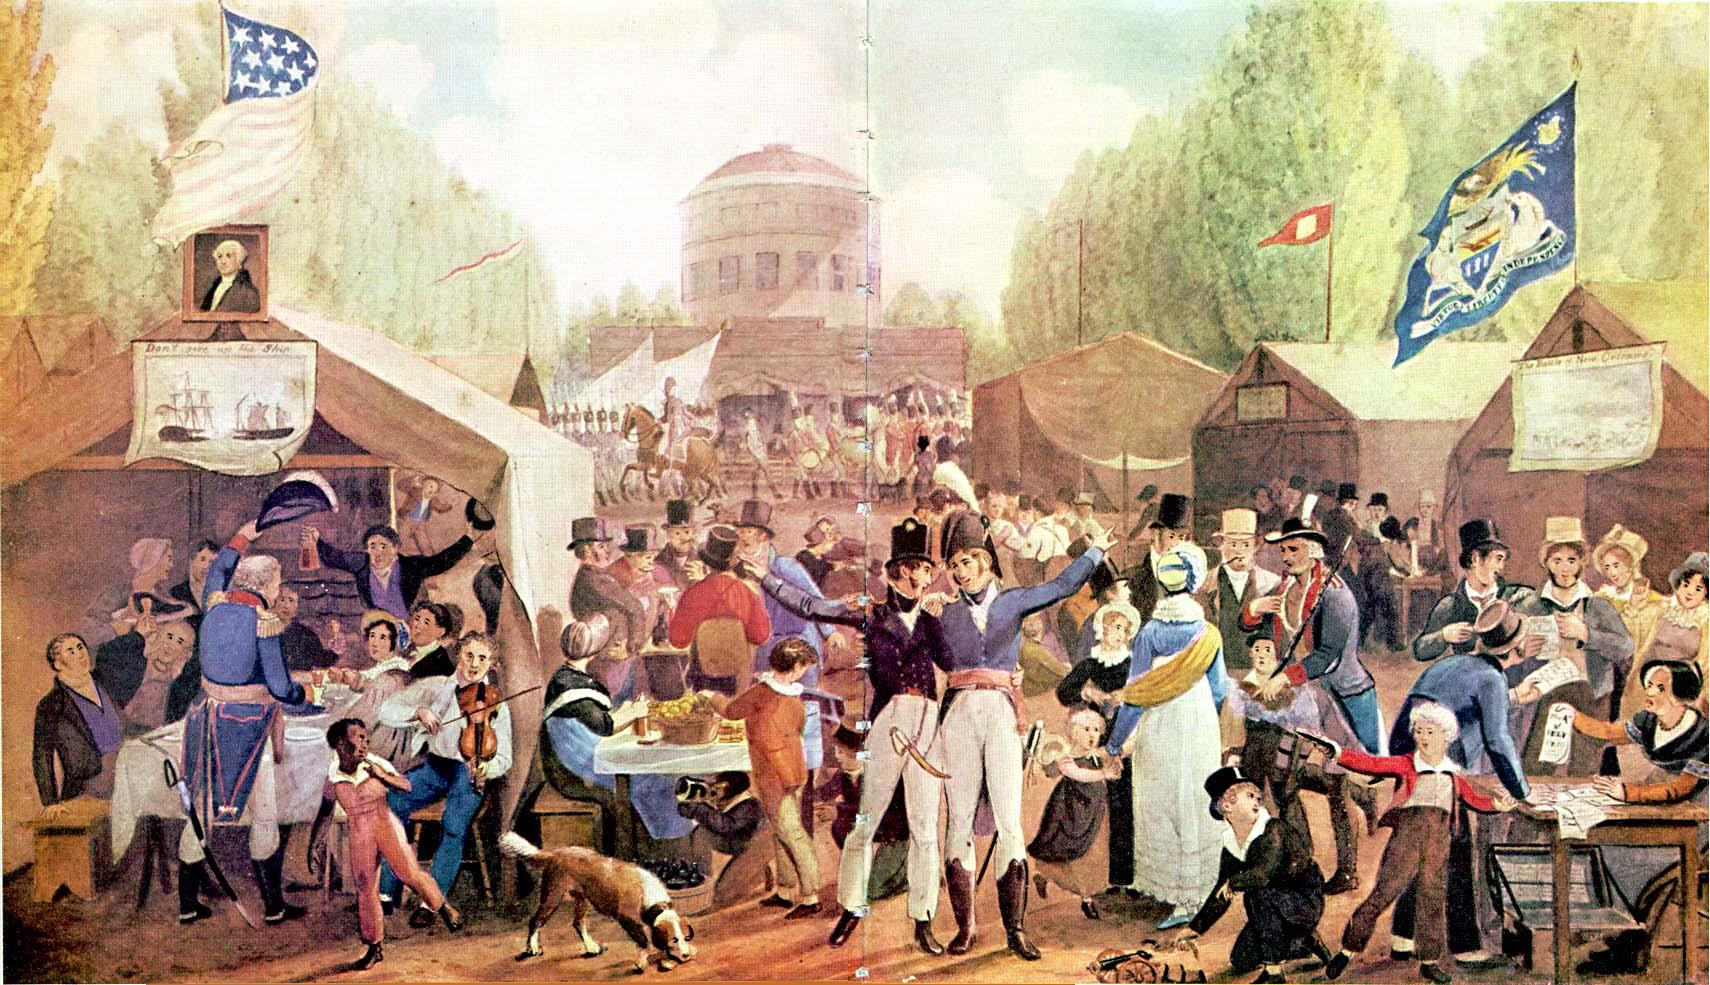 1819 4th of July in Philadelphia